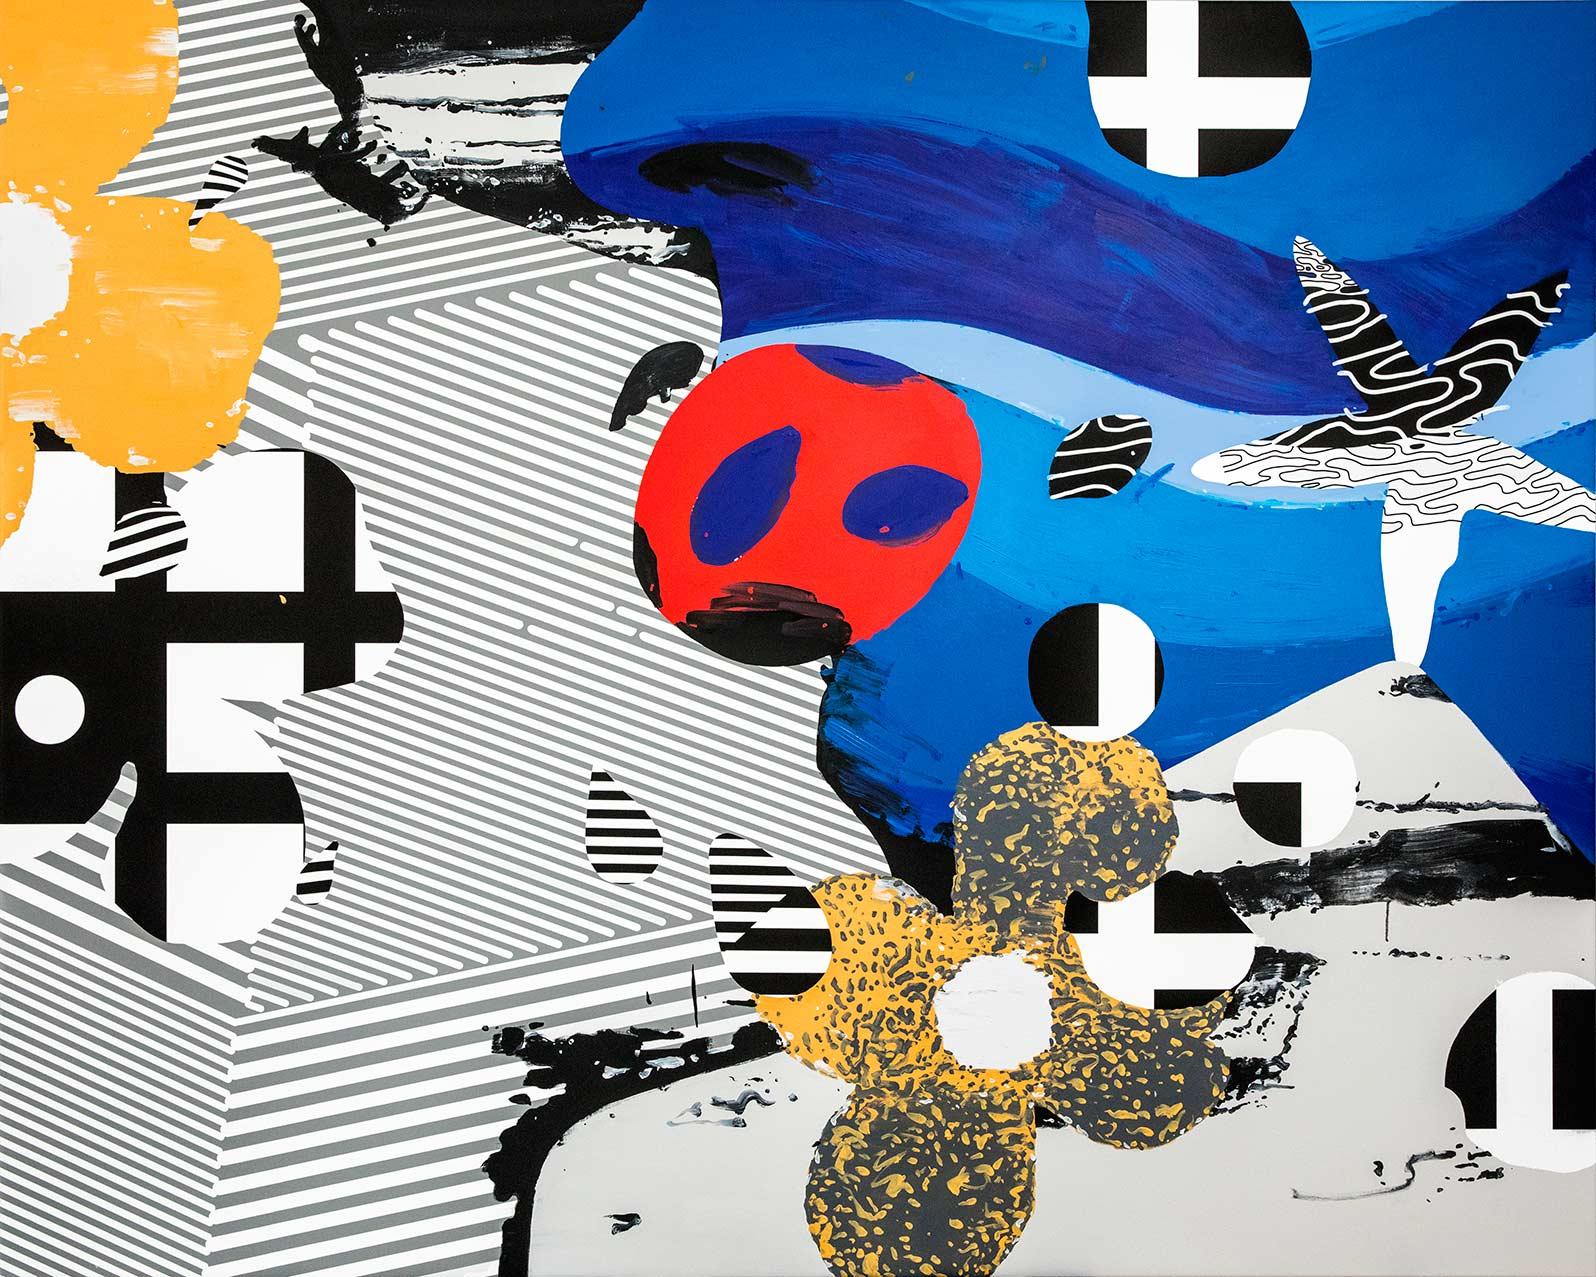 Anca Stefanescu | Mixed Media | Inception, Modern Art Acrylic Paintings